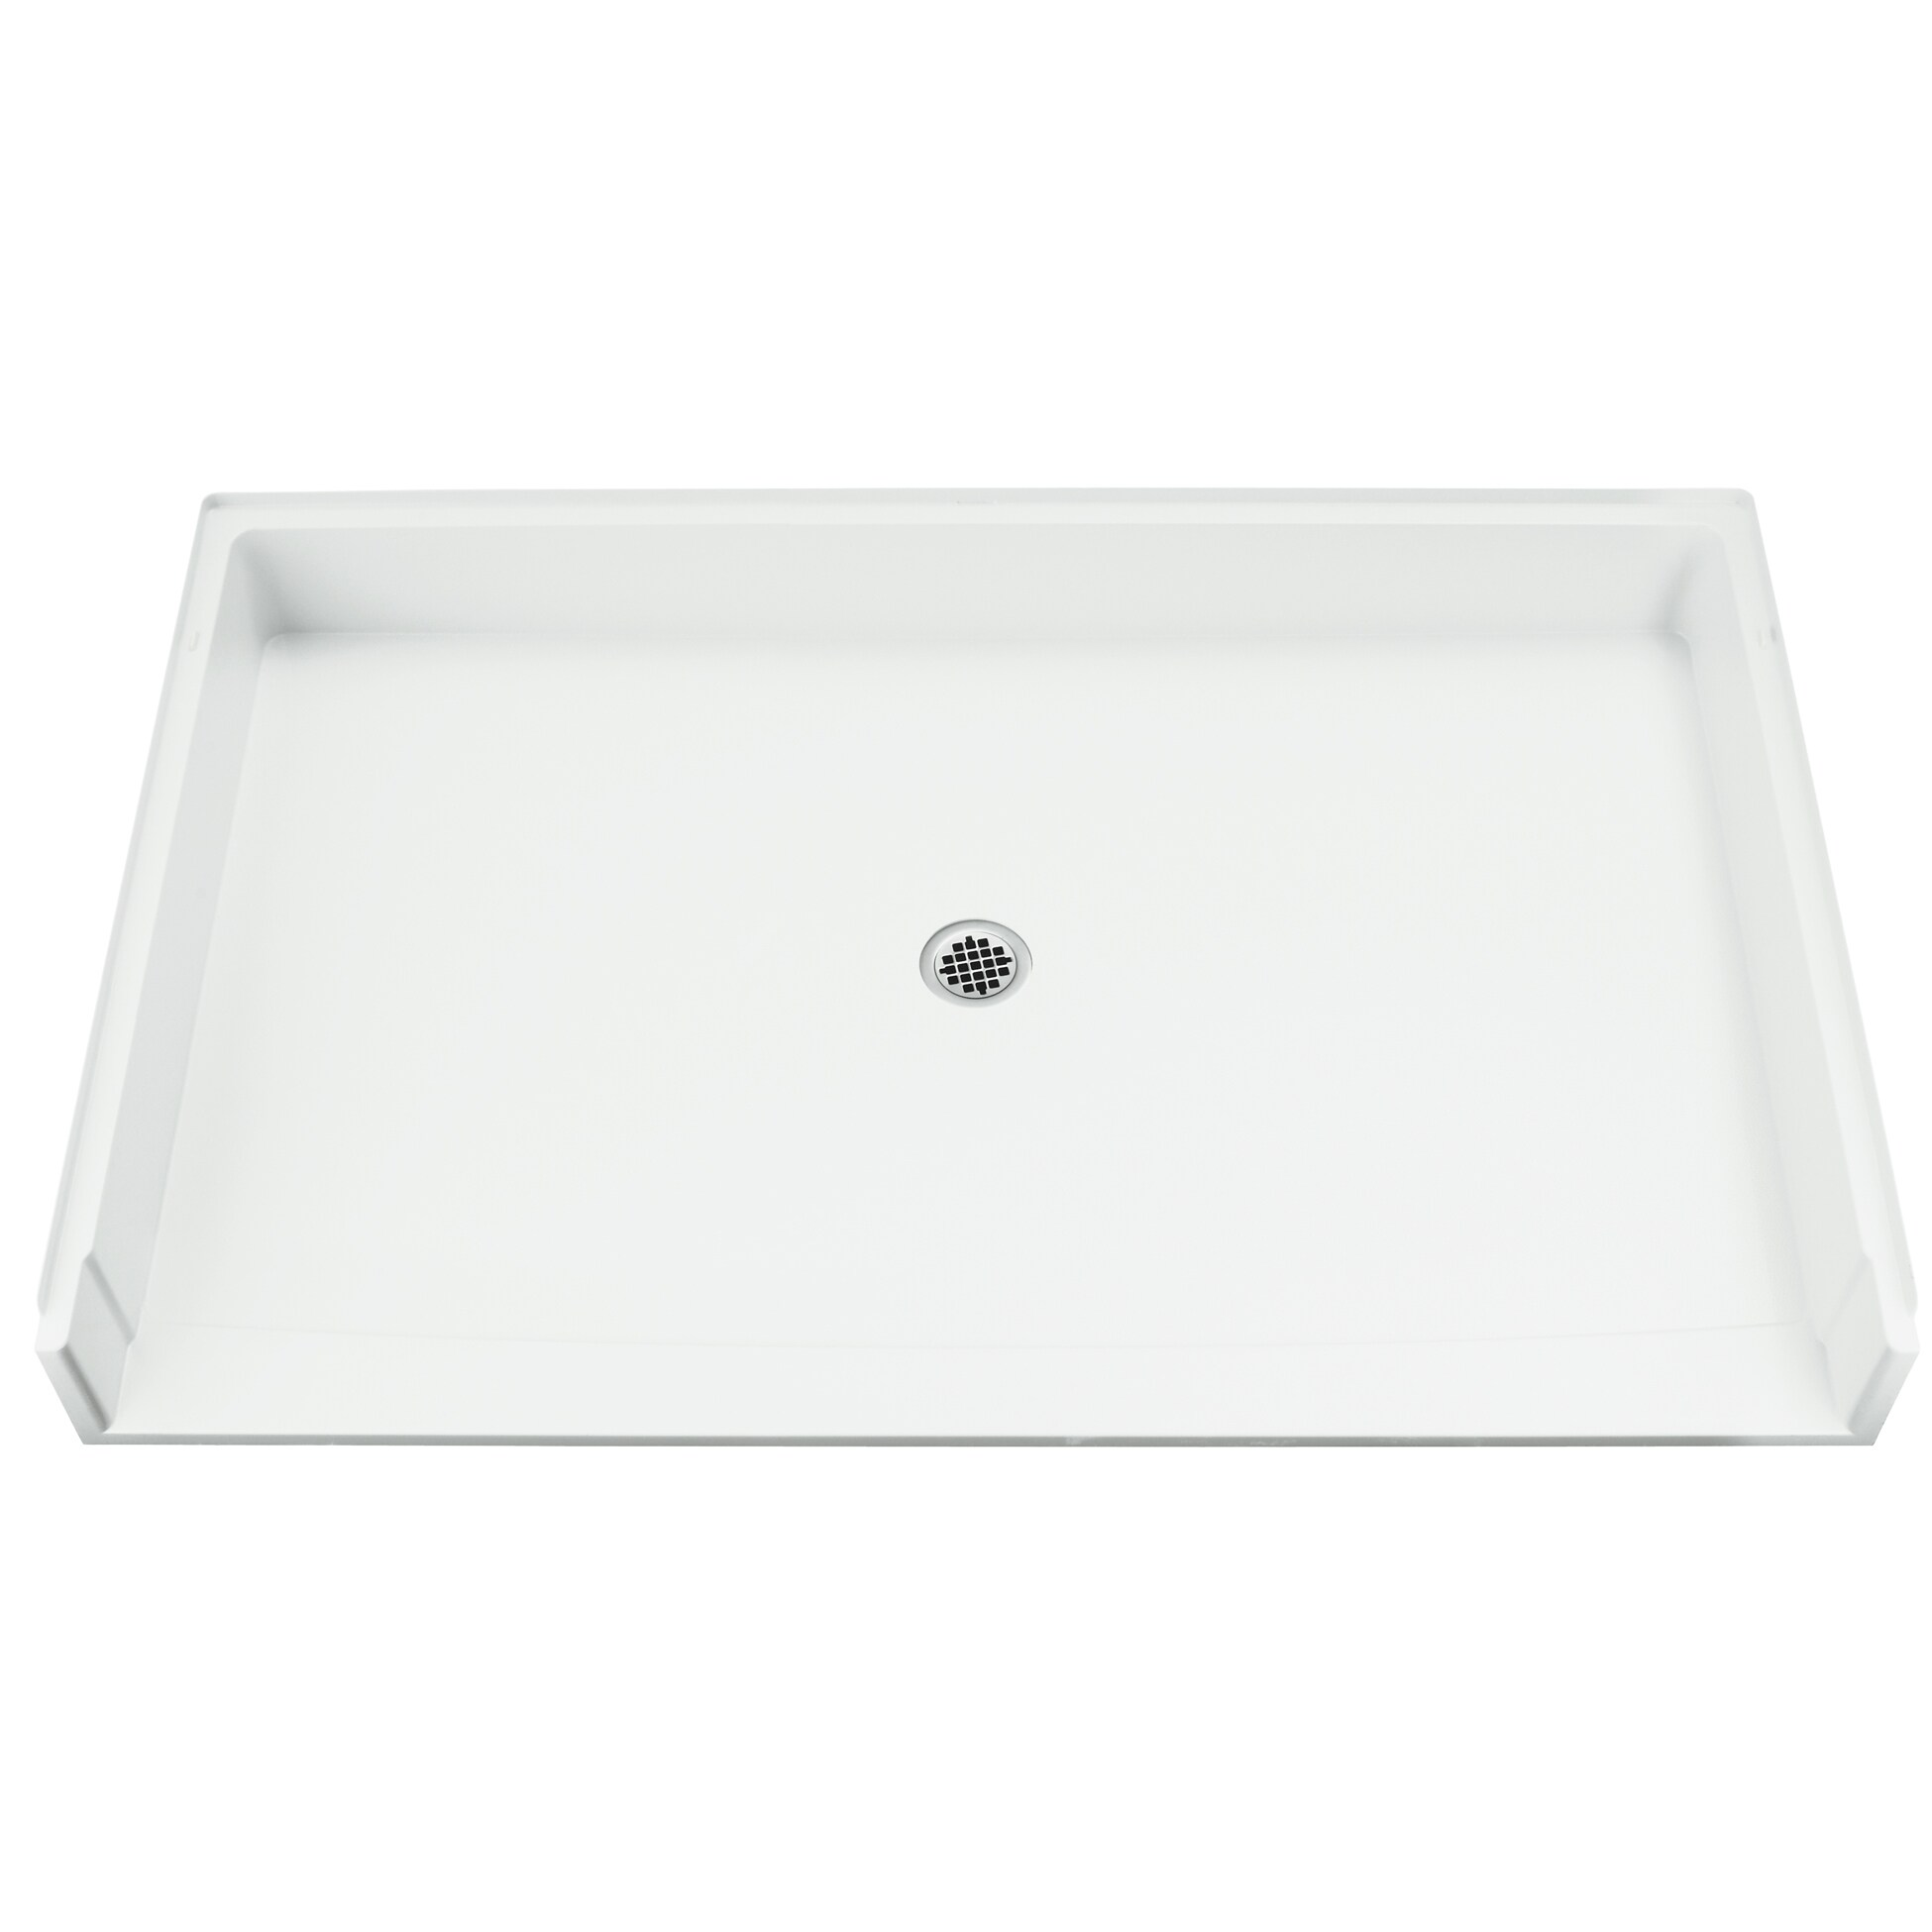 Sterling Roll-in White Single Threshold Shower Receptor